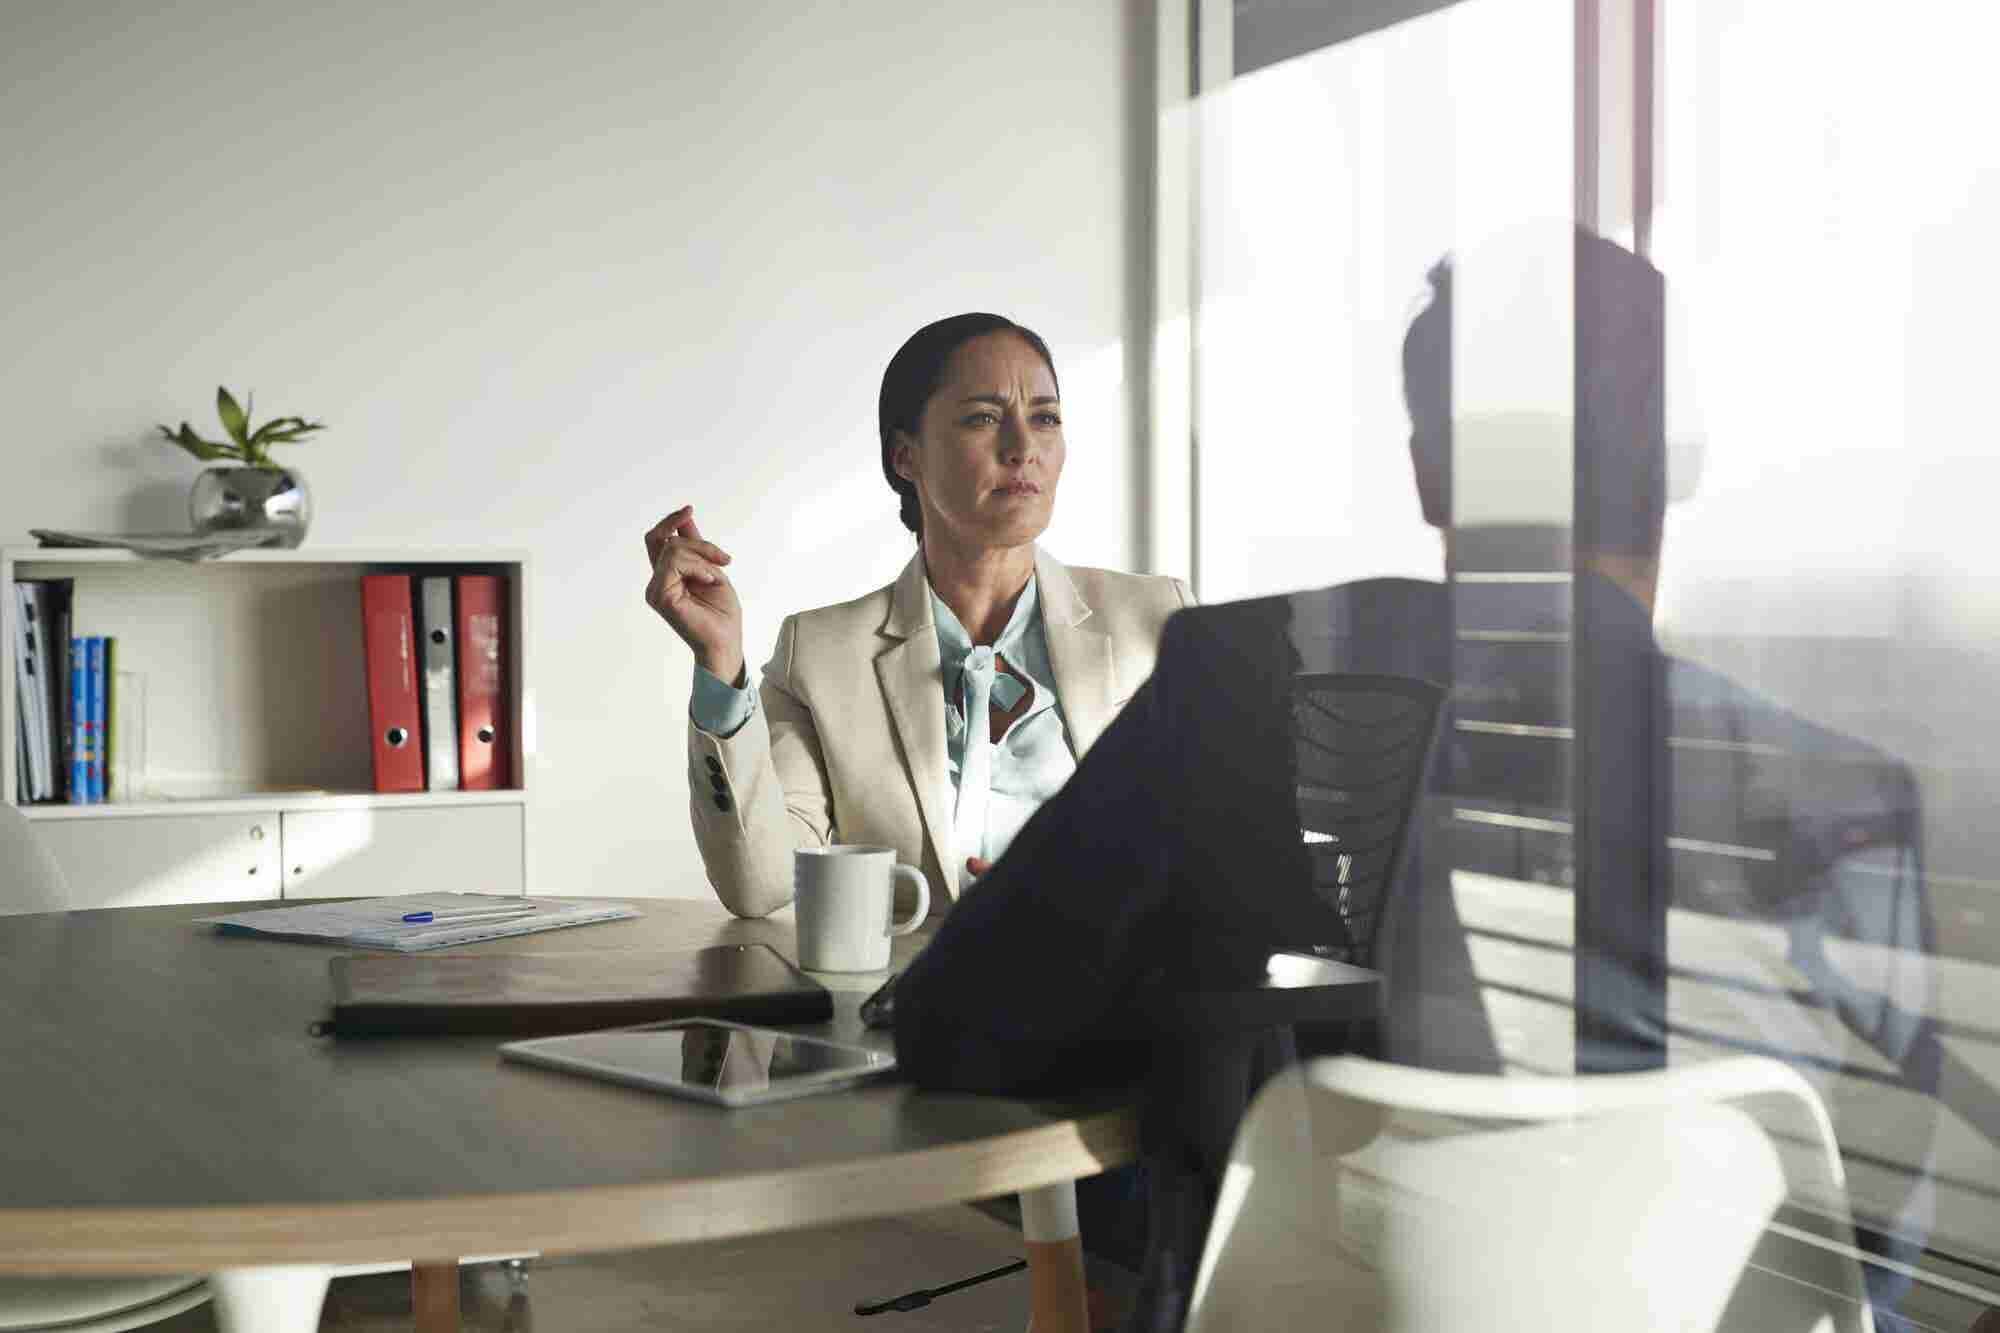 5 Ways to Avoid Common CEO Mistakes